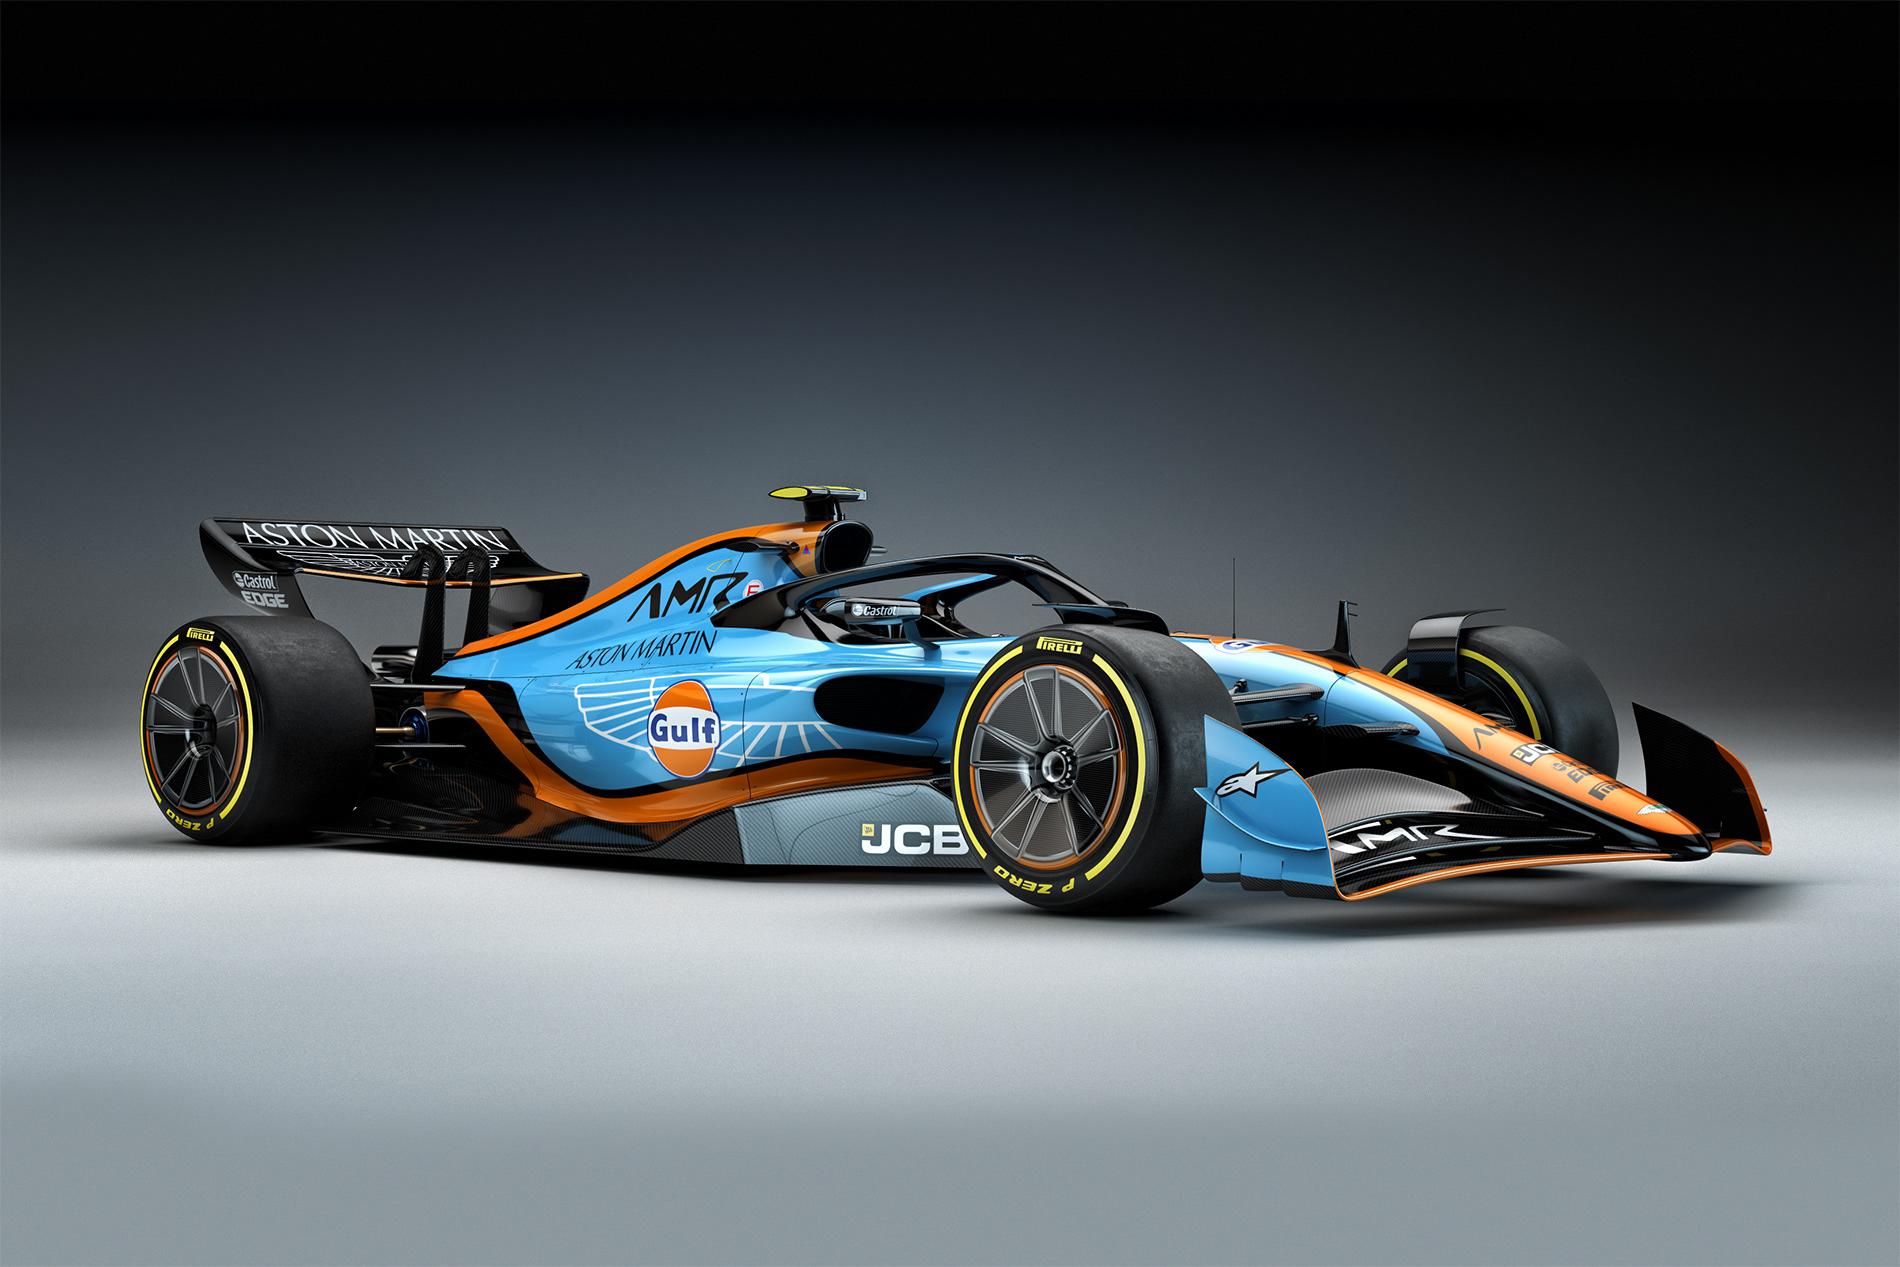 F1 Aston Martin Concept 2021 On Behance